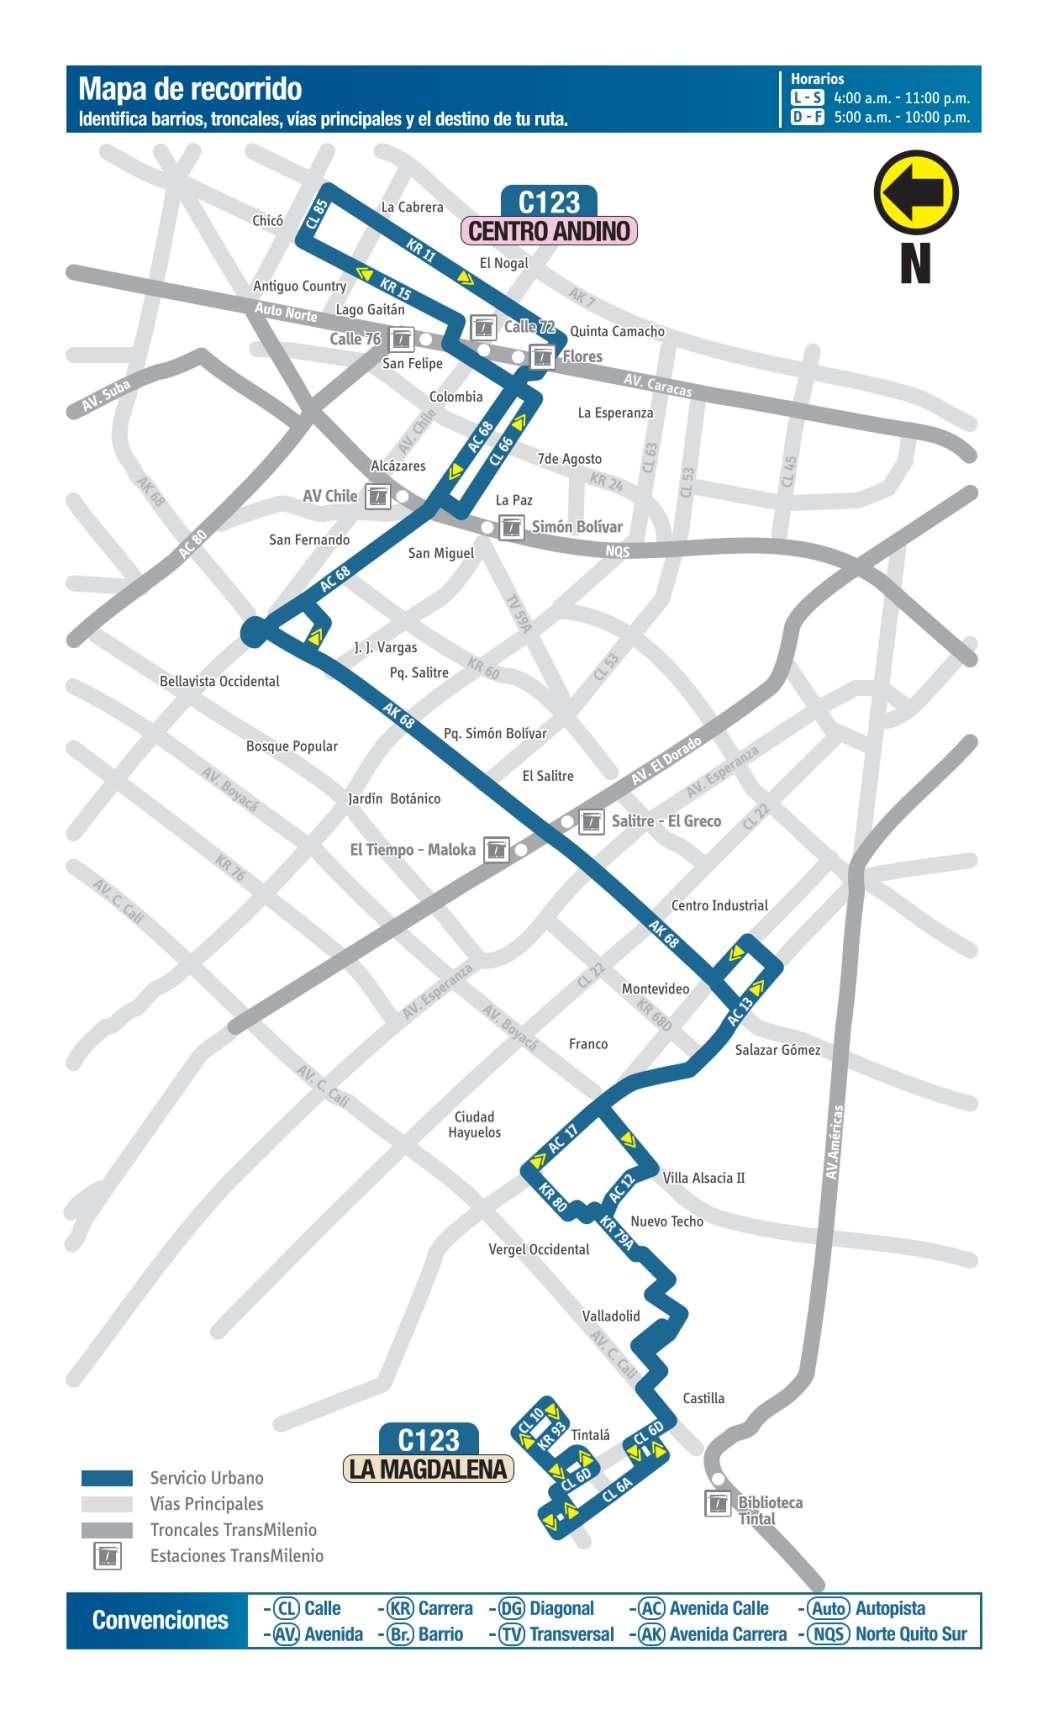 C123 La Magdalena - Centro Andino, mapa bus urbano Bogotá